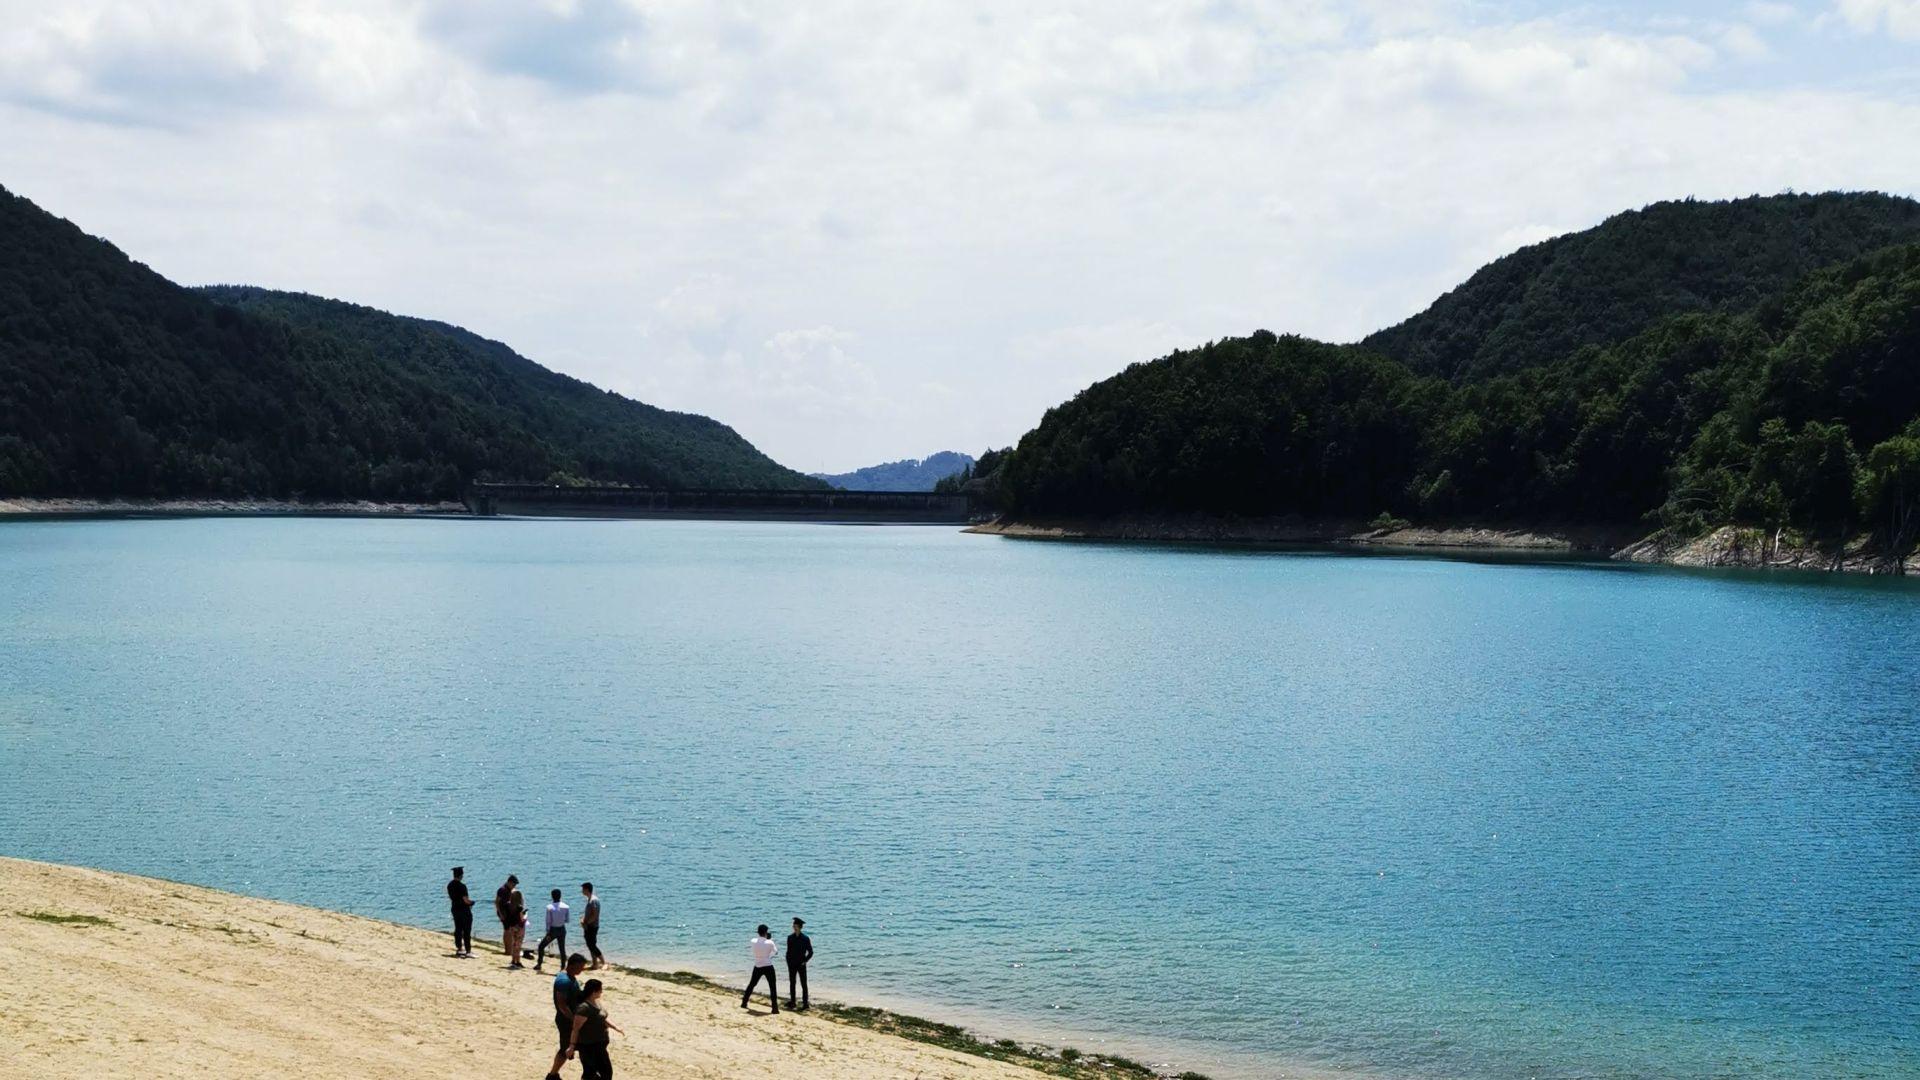 Lacul Paltinoasa